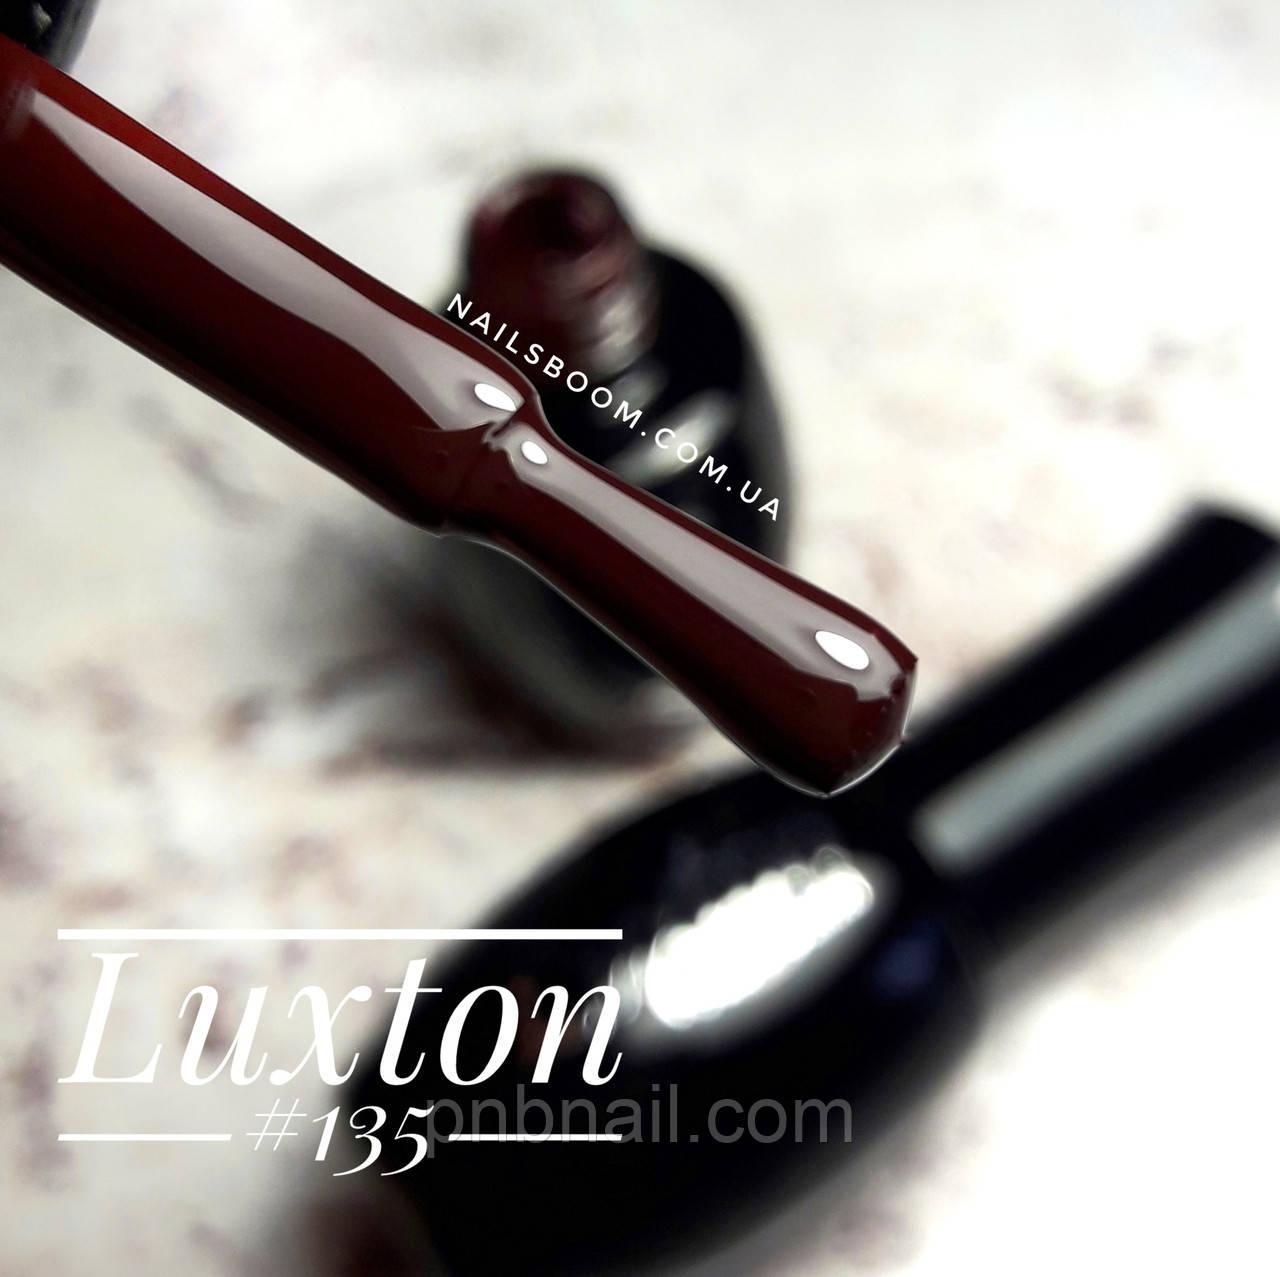 LUXTON premium № 135, 10 мл , фото 1